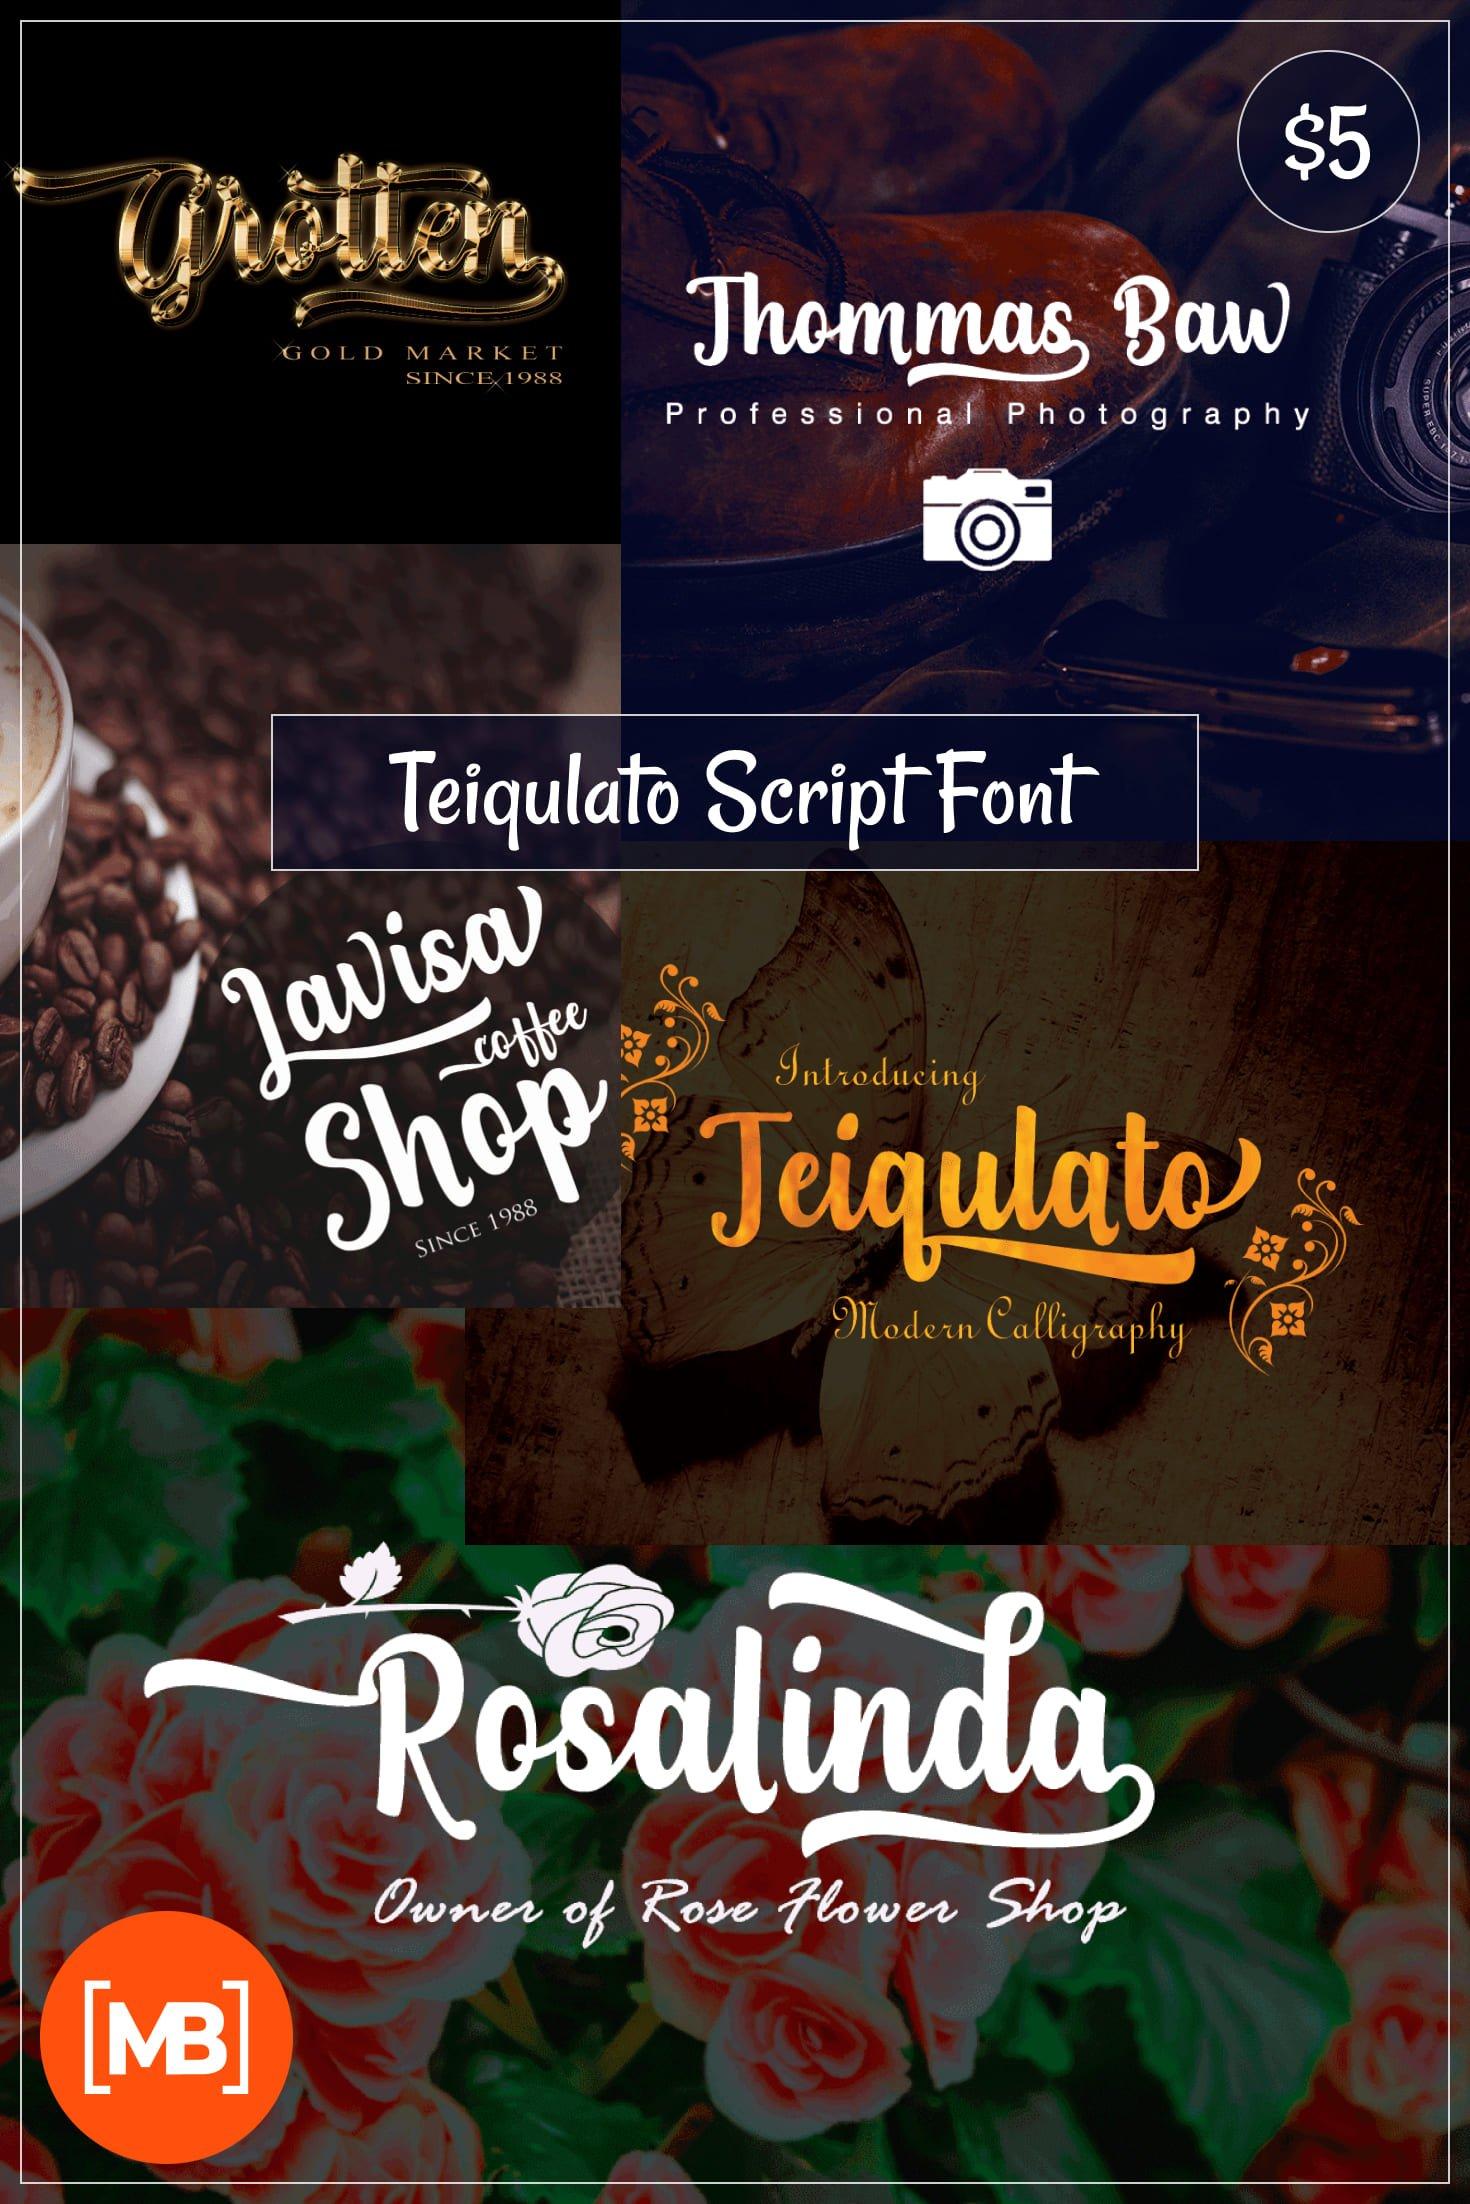 Download Teiqulato Script Font - $5. Collage Image.